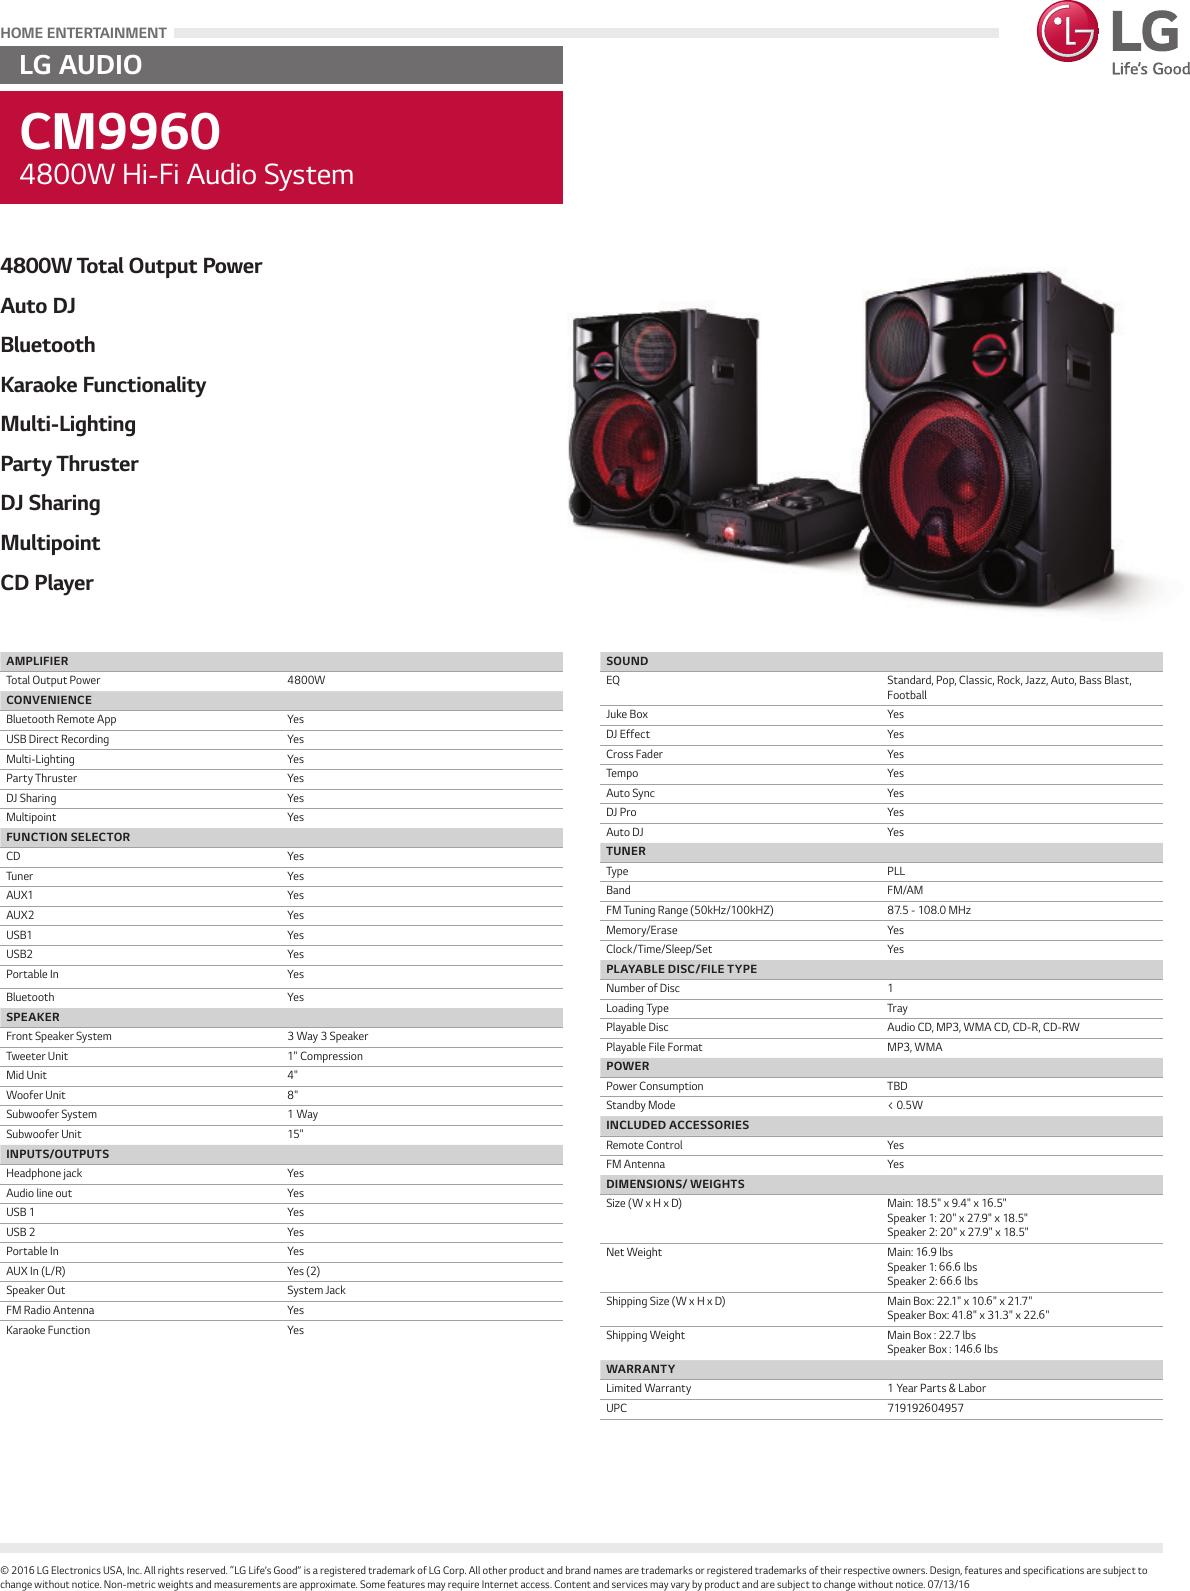 lg cm9960 user manual specification spec sheet rh usermanual wiki LG Extravert Manual LG Flip Phone Manual